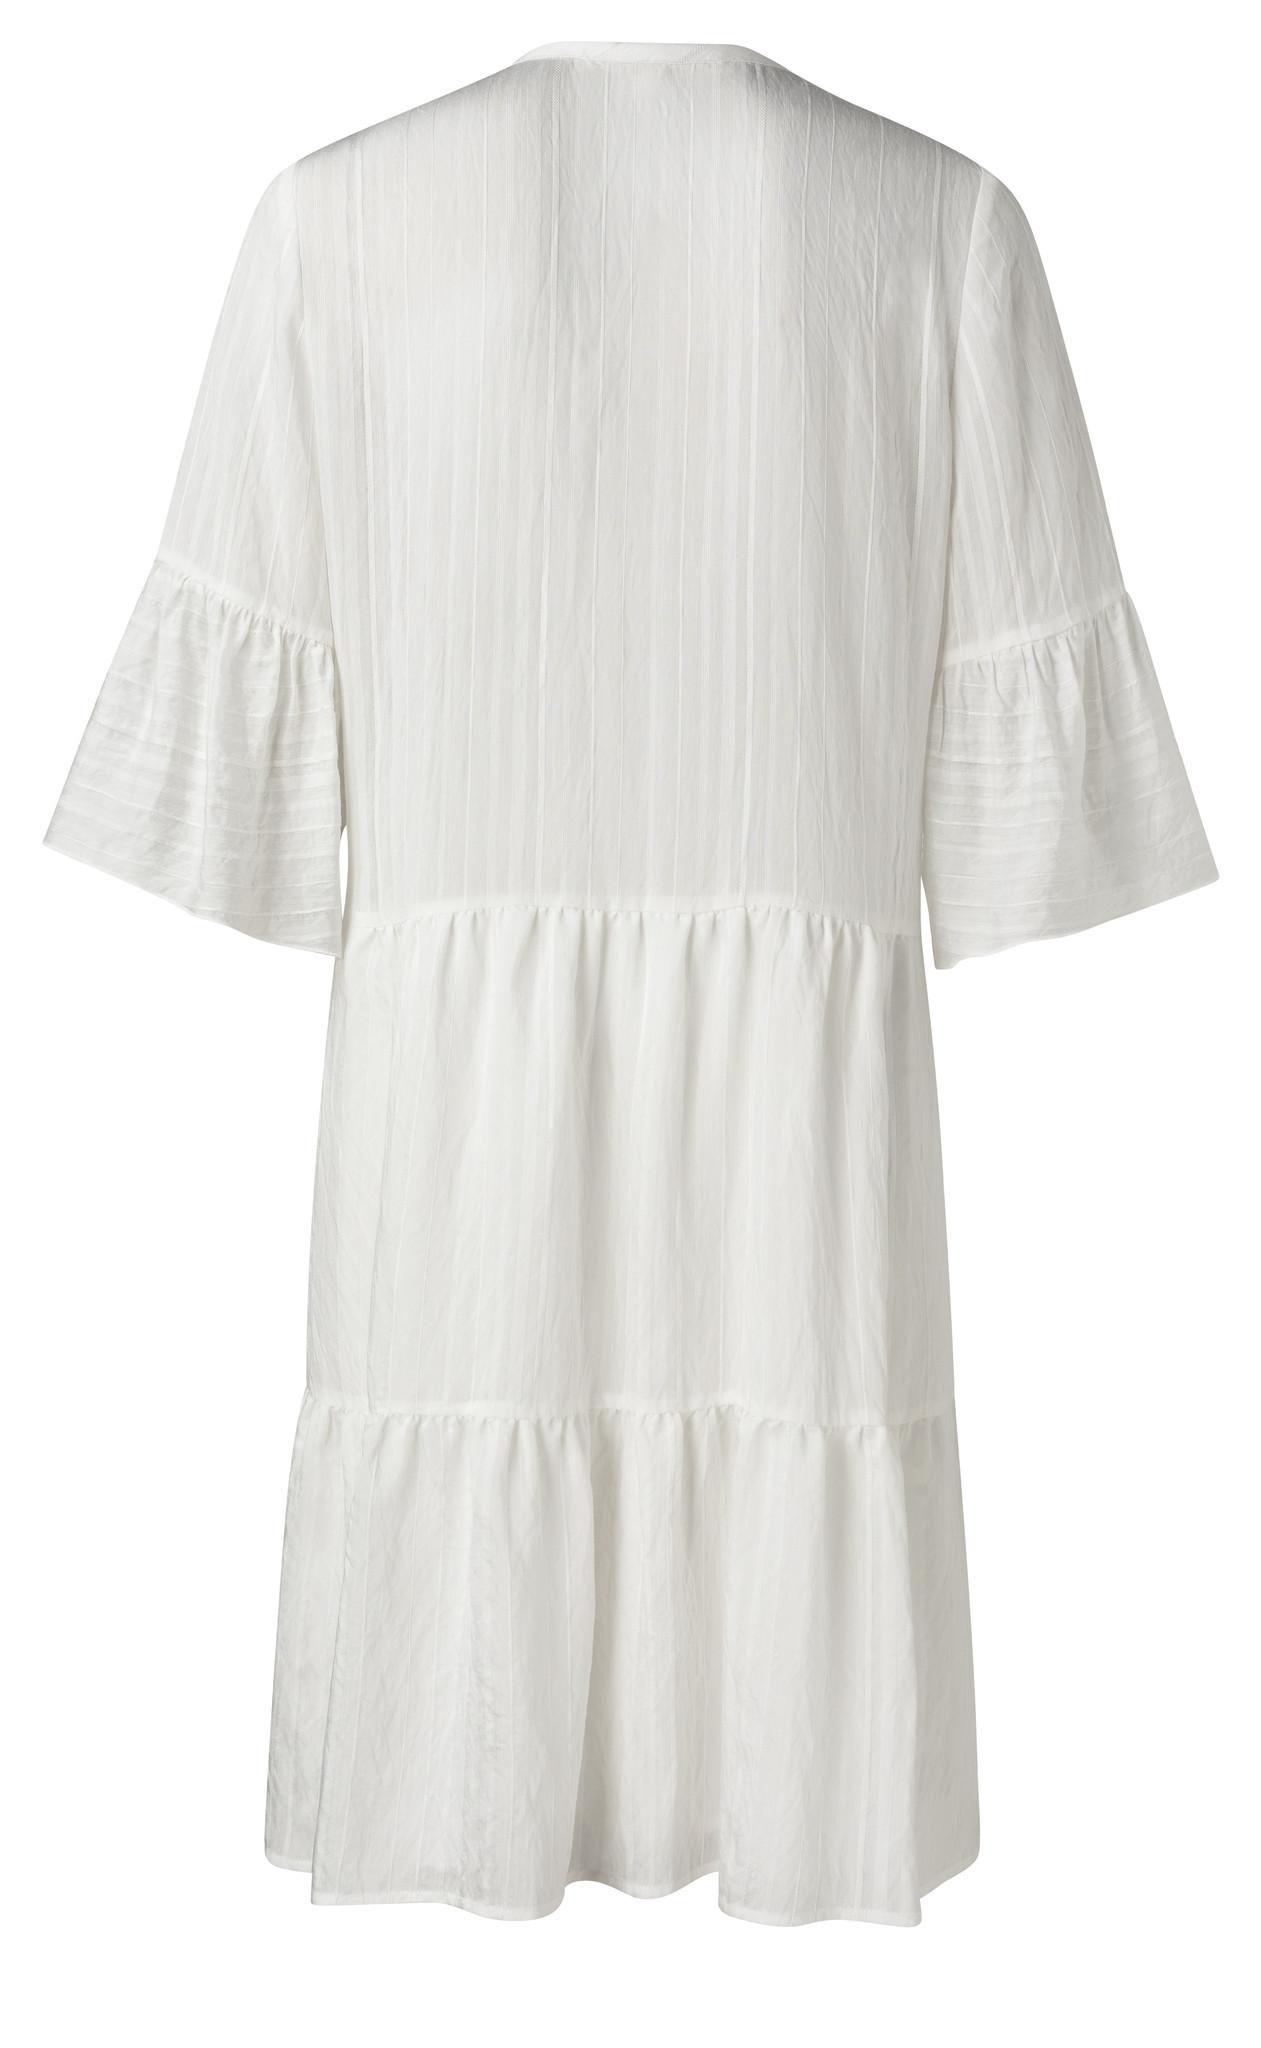 yaya Midi a-line dress 1801335-114-2